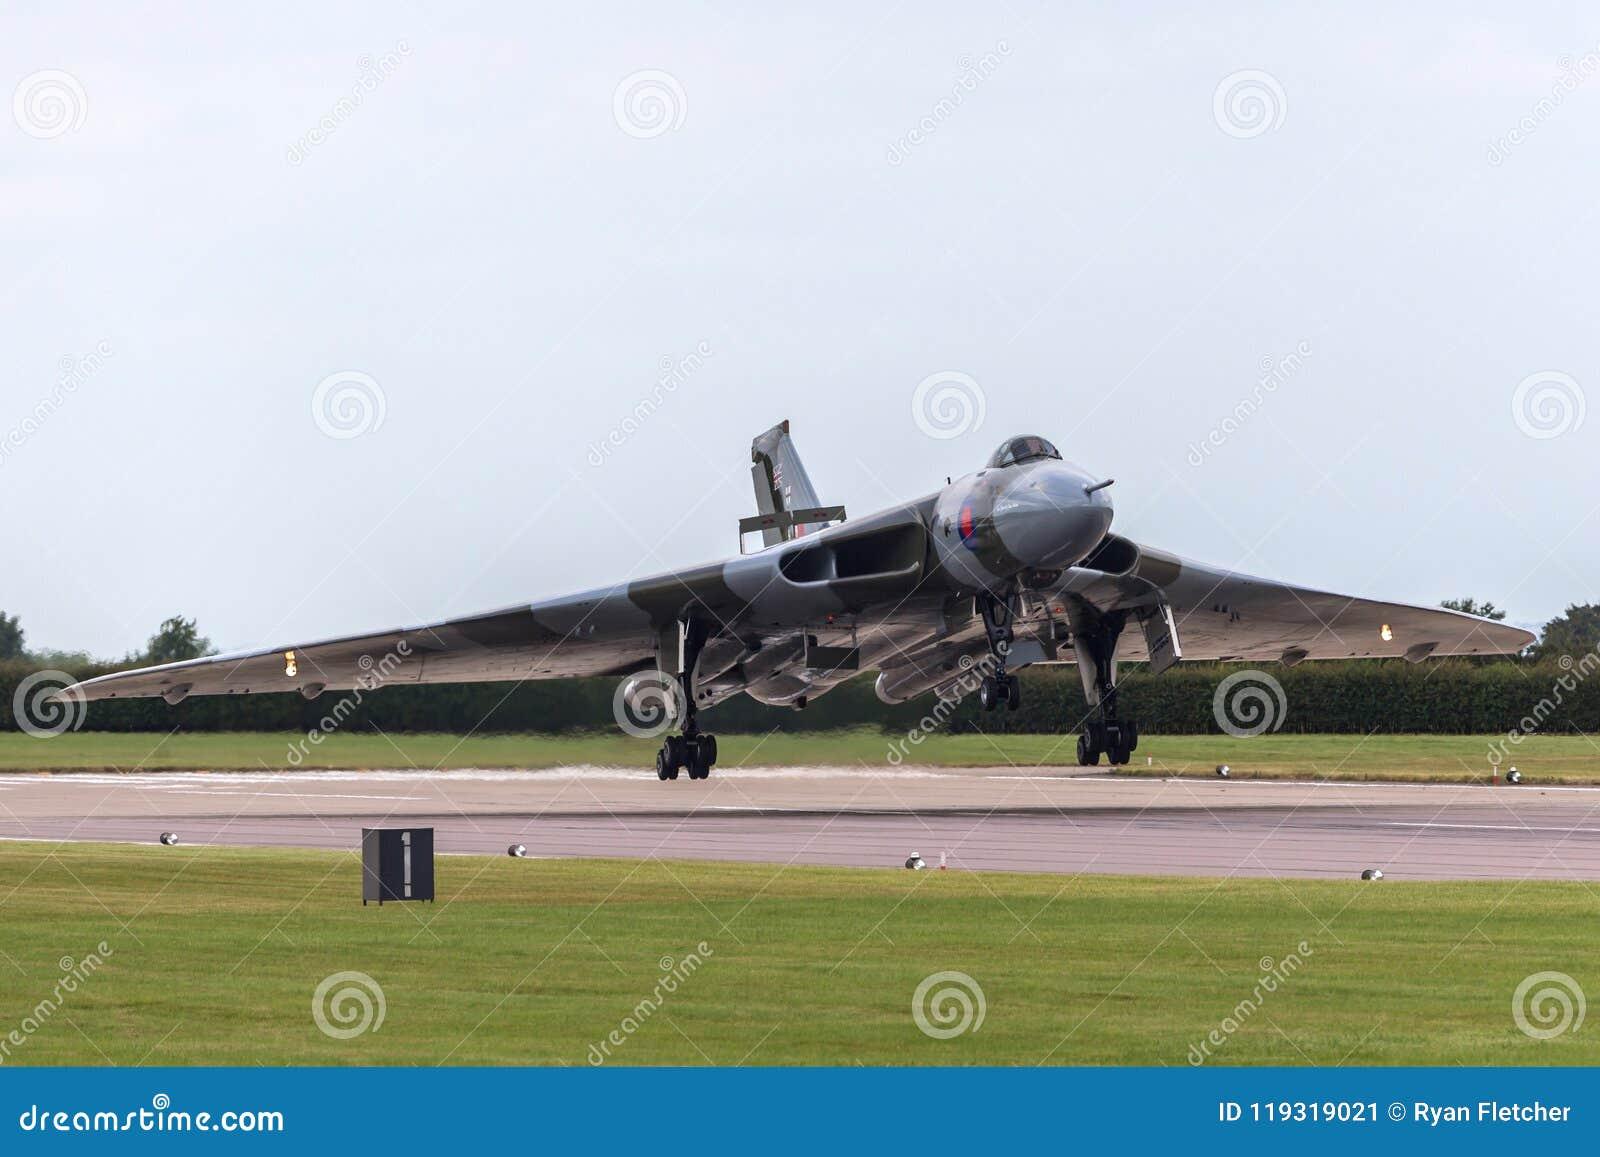 Former Royal Air Force RAF Avro Vulcan B 2 Bomber Aircraft